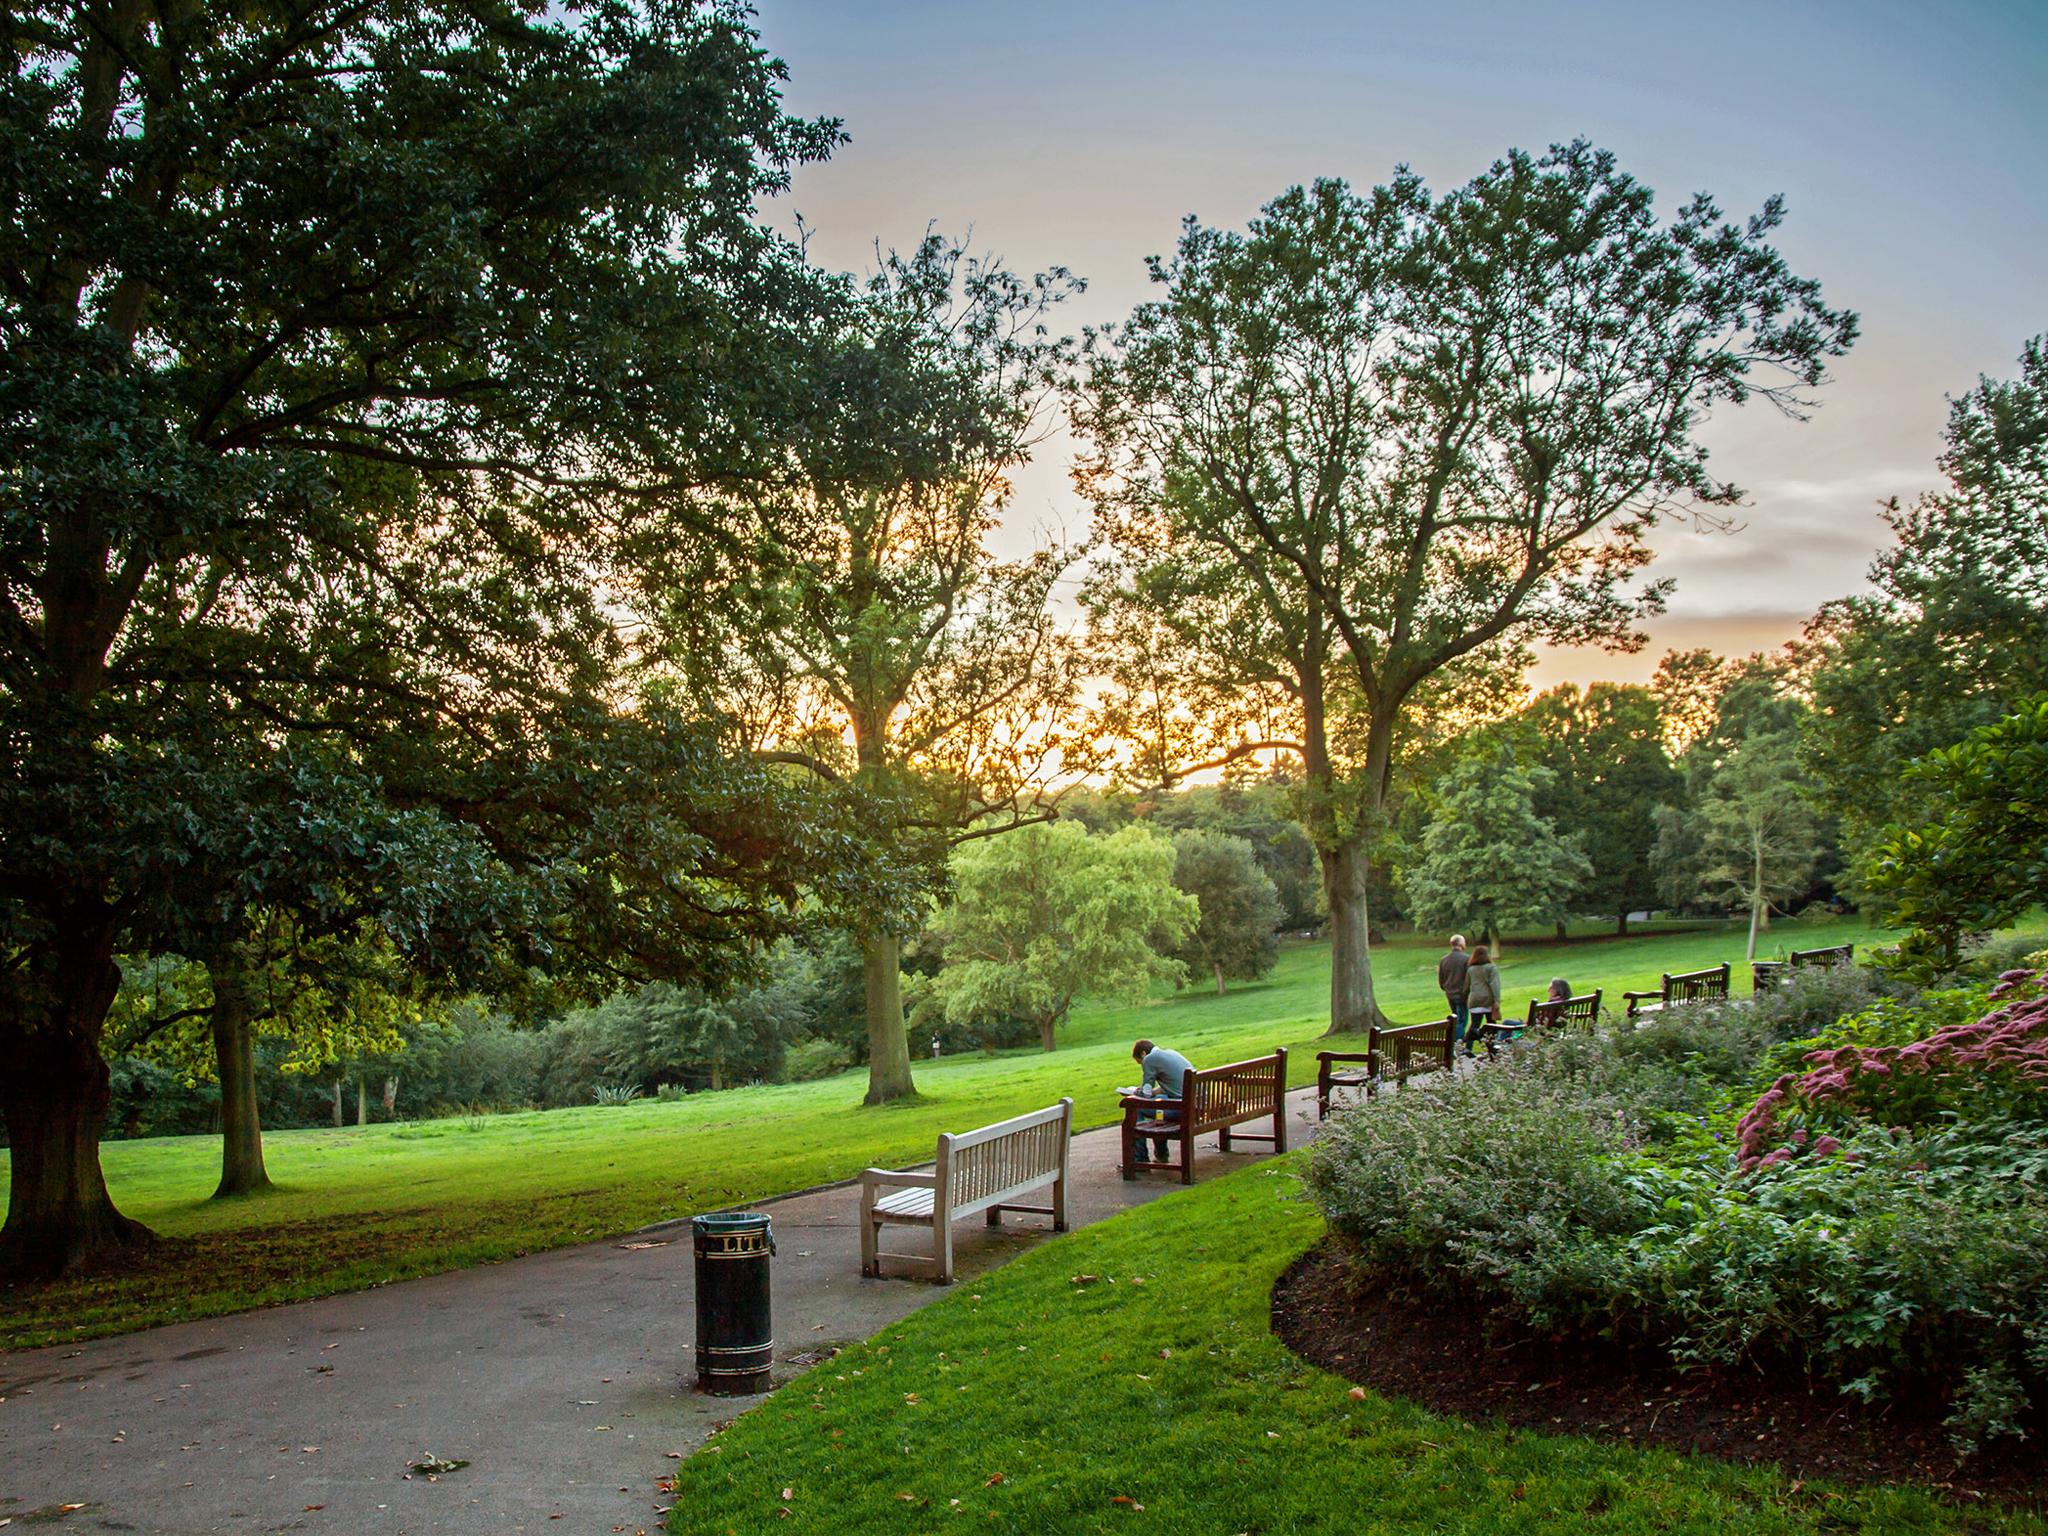 Waterlow Park, Highgate